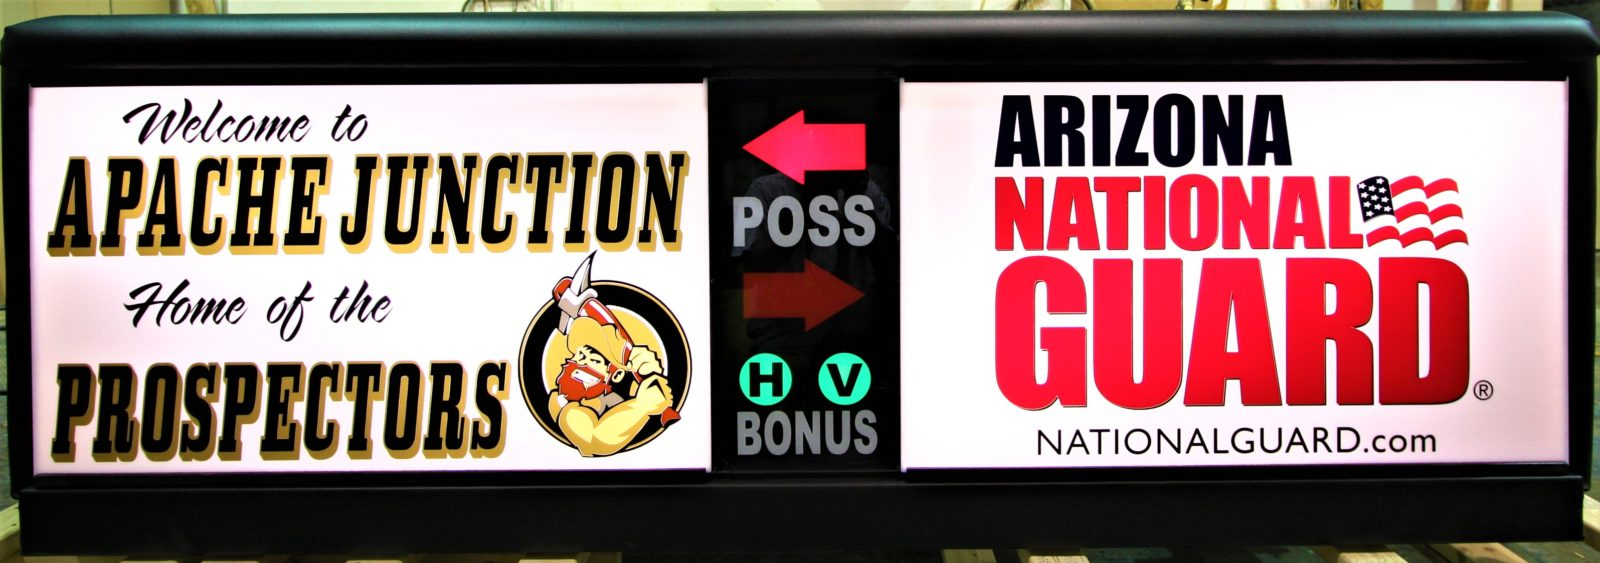 Apache Junction Arizona Army National Guard AZARNG